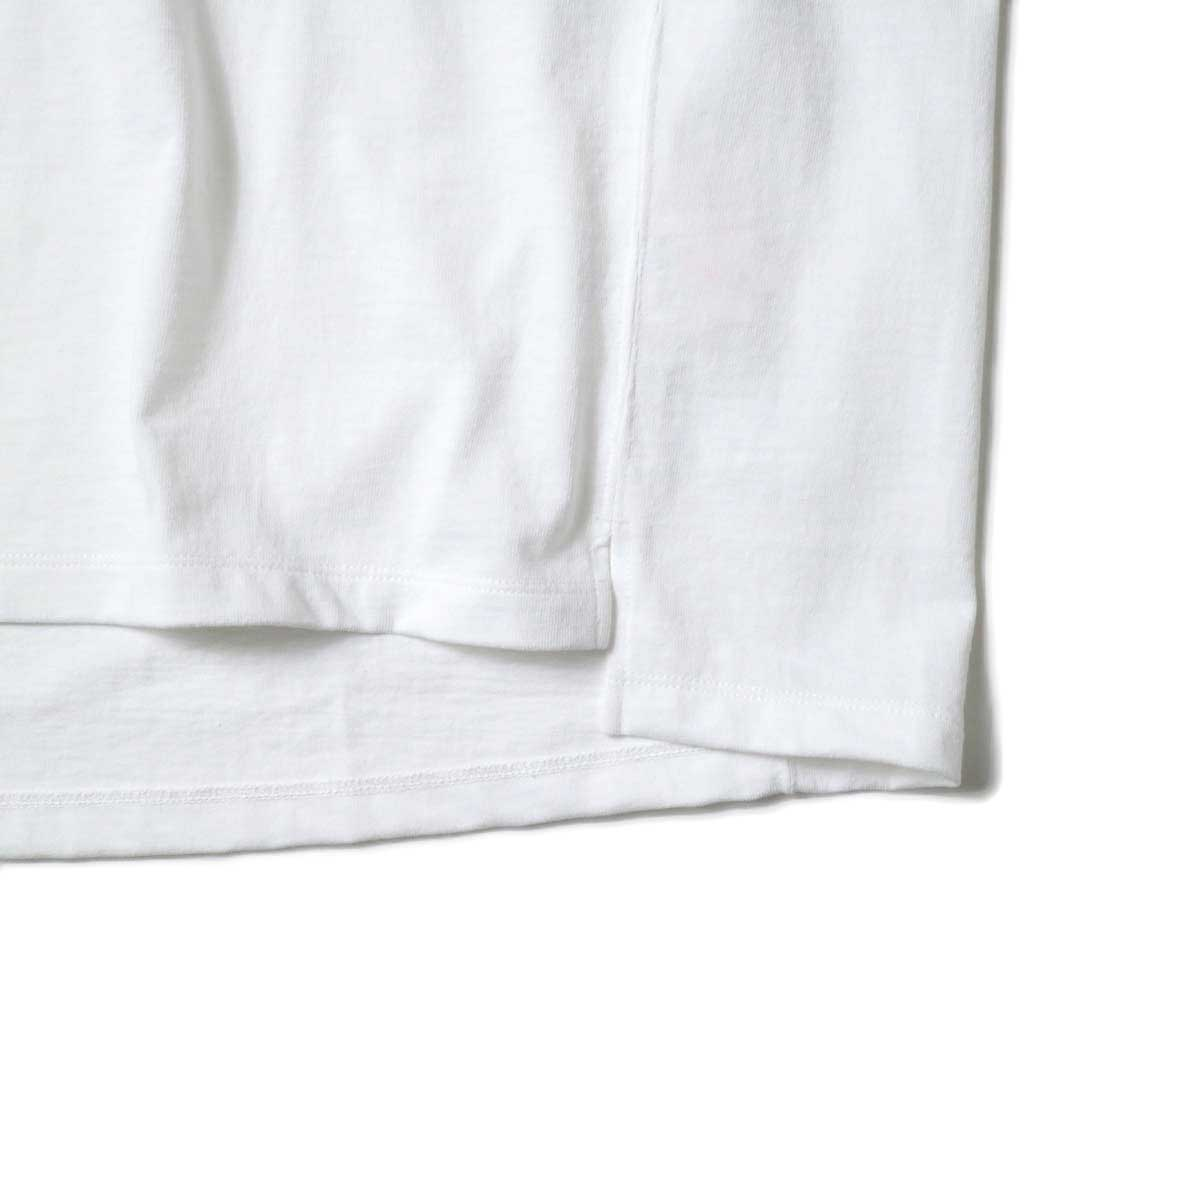 alvana / Protect Football S/S Tee (White)裾